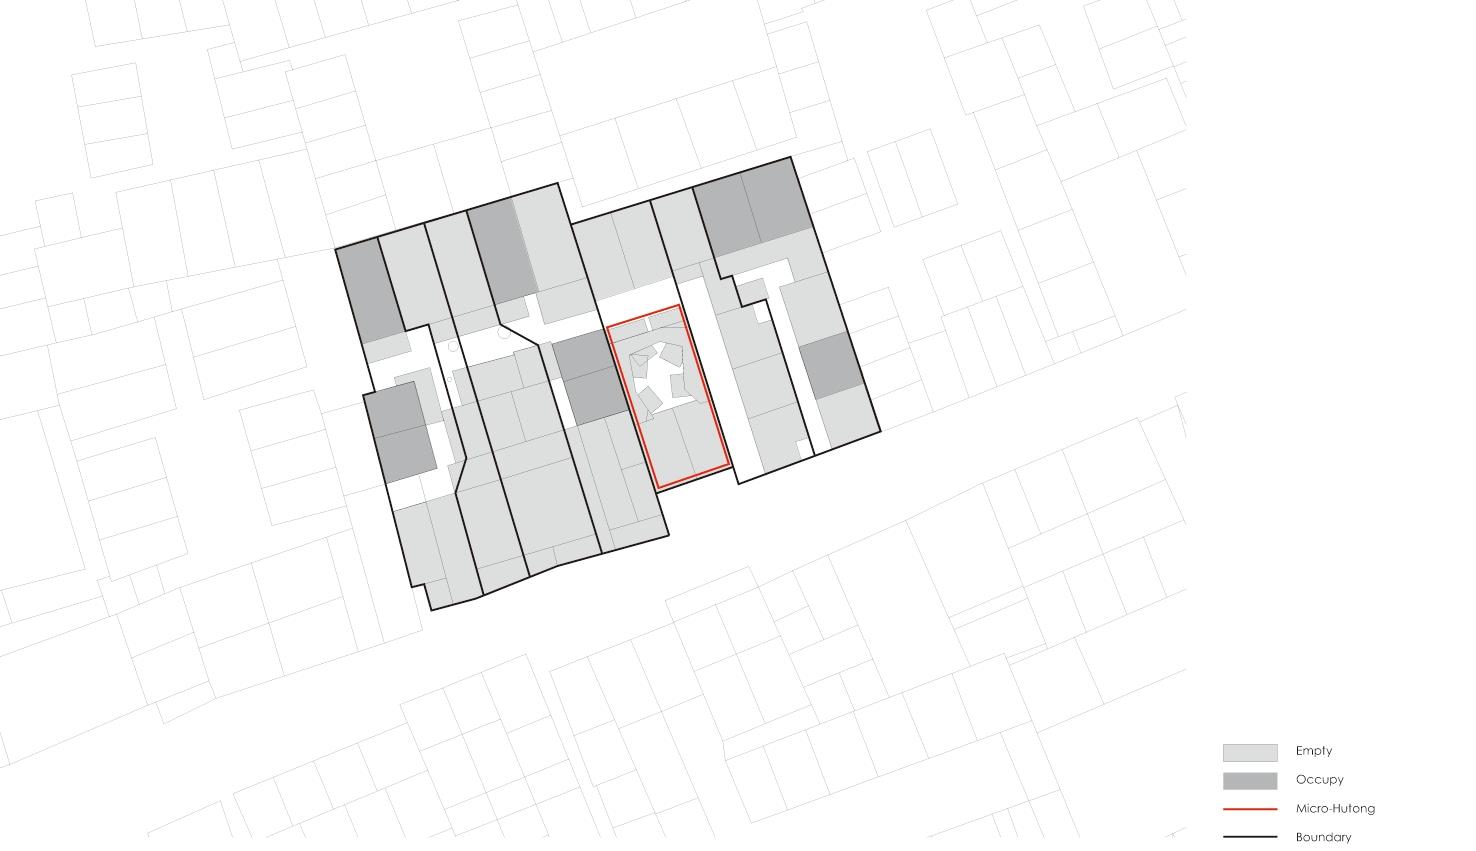 03_Location_微胡同位置.jpg